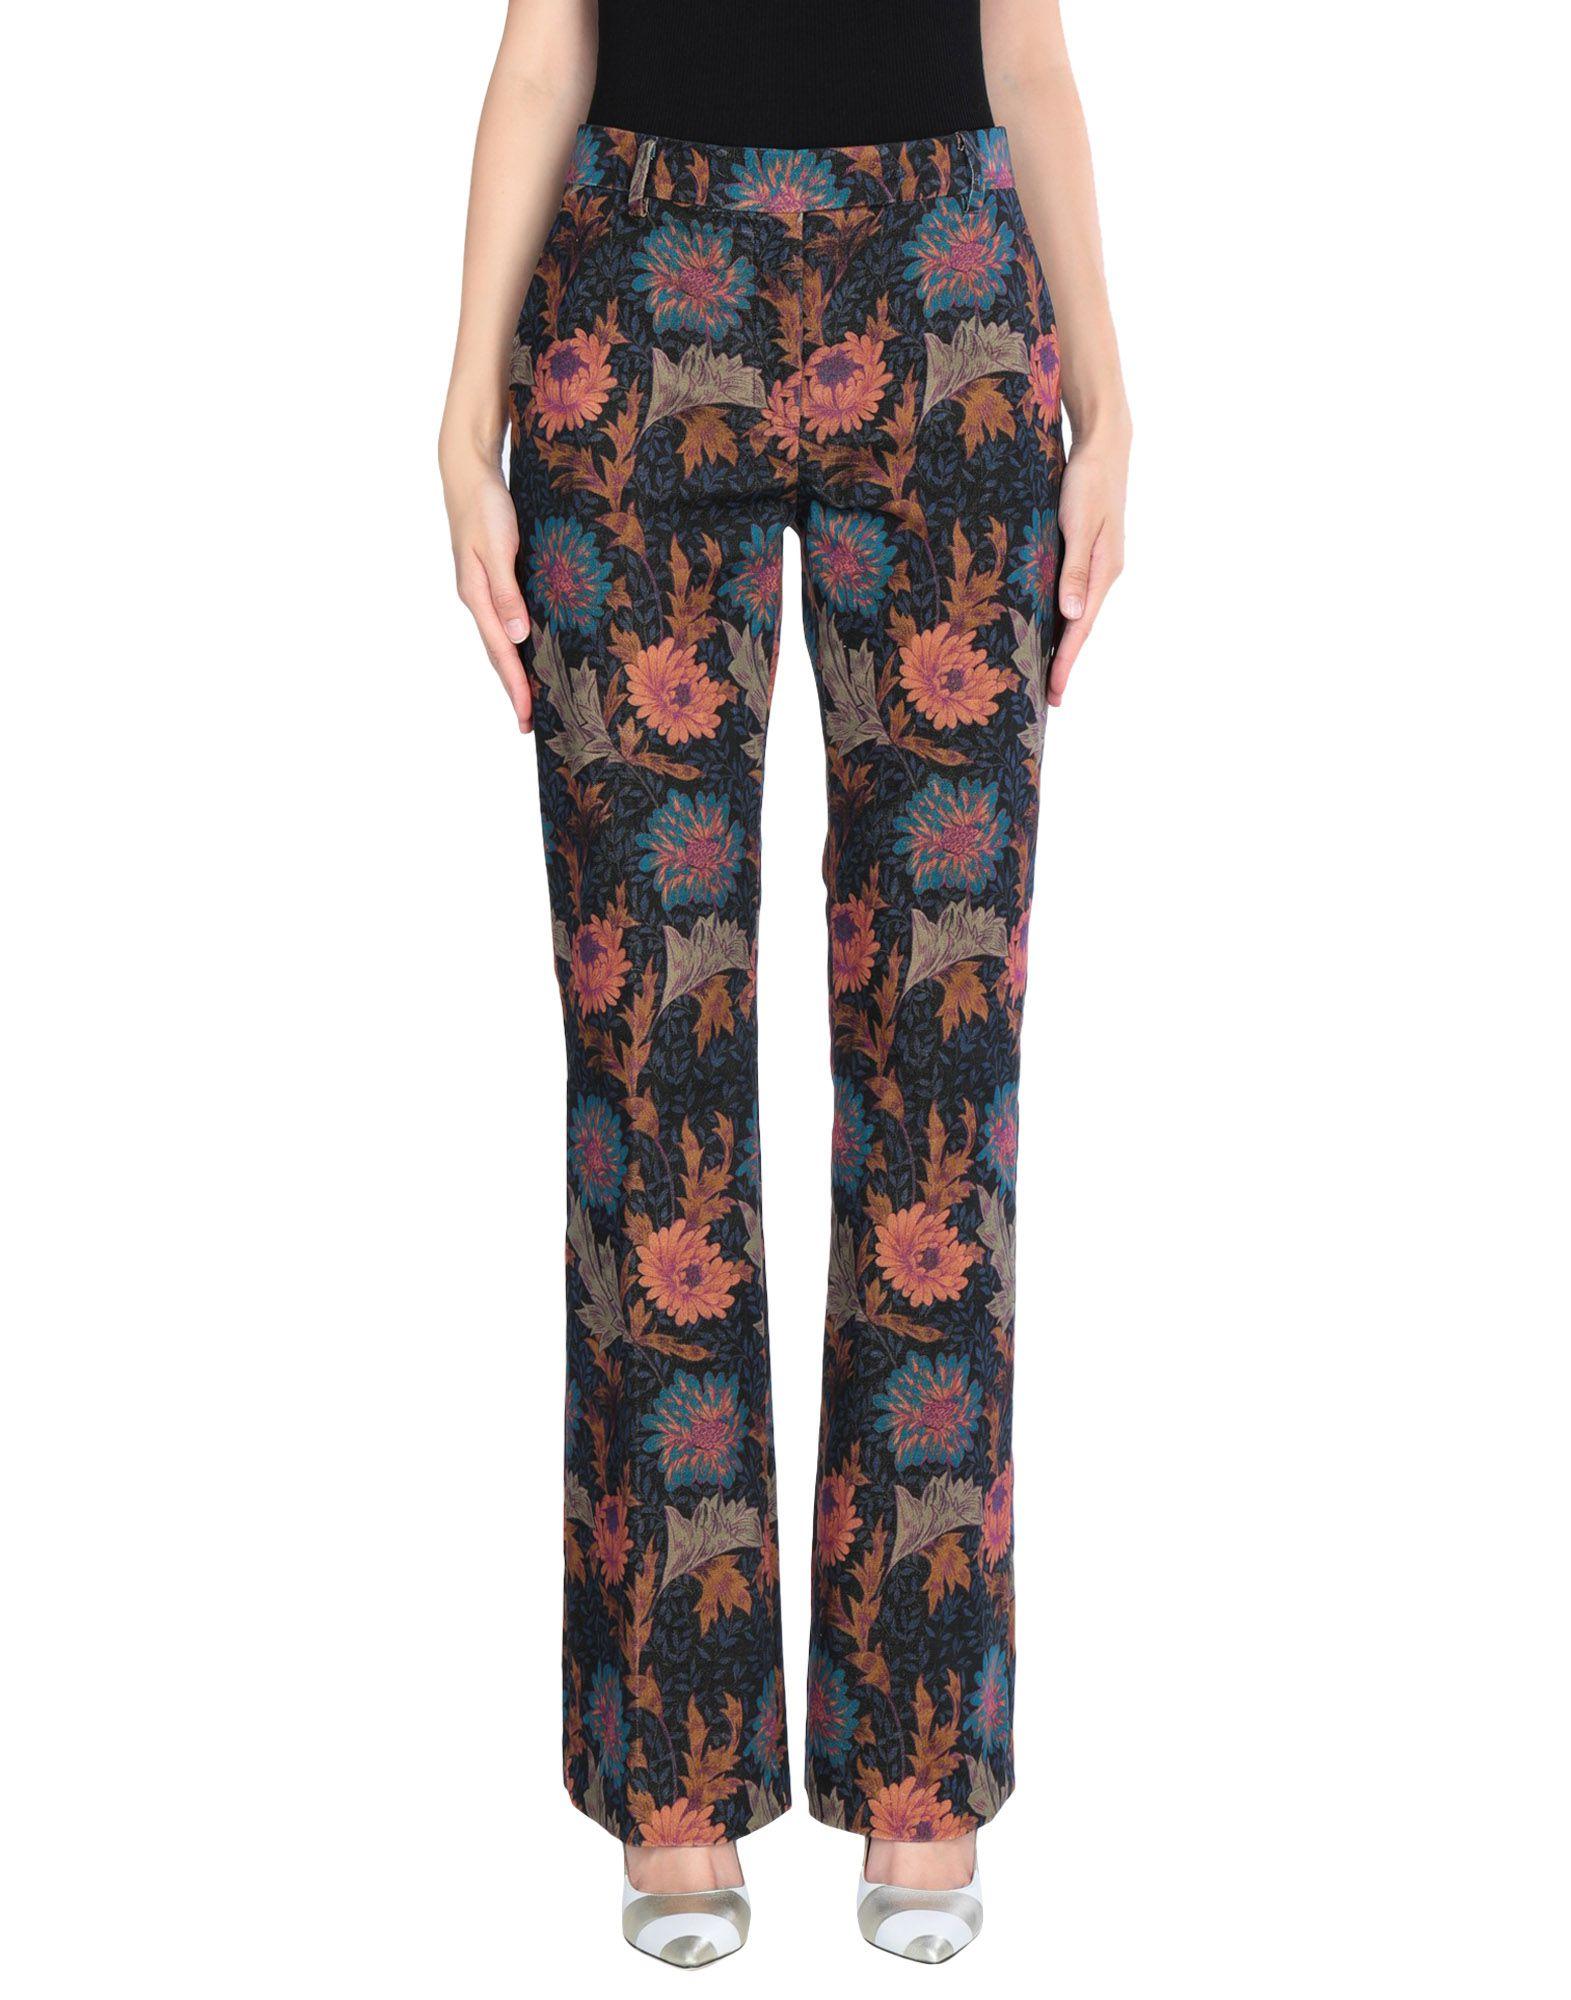 FABERGE&ROCHES Повседневные брюки